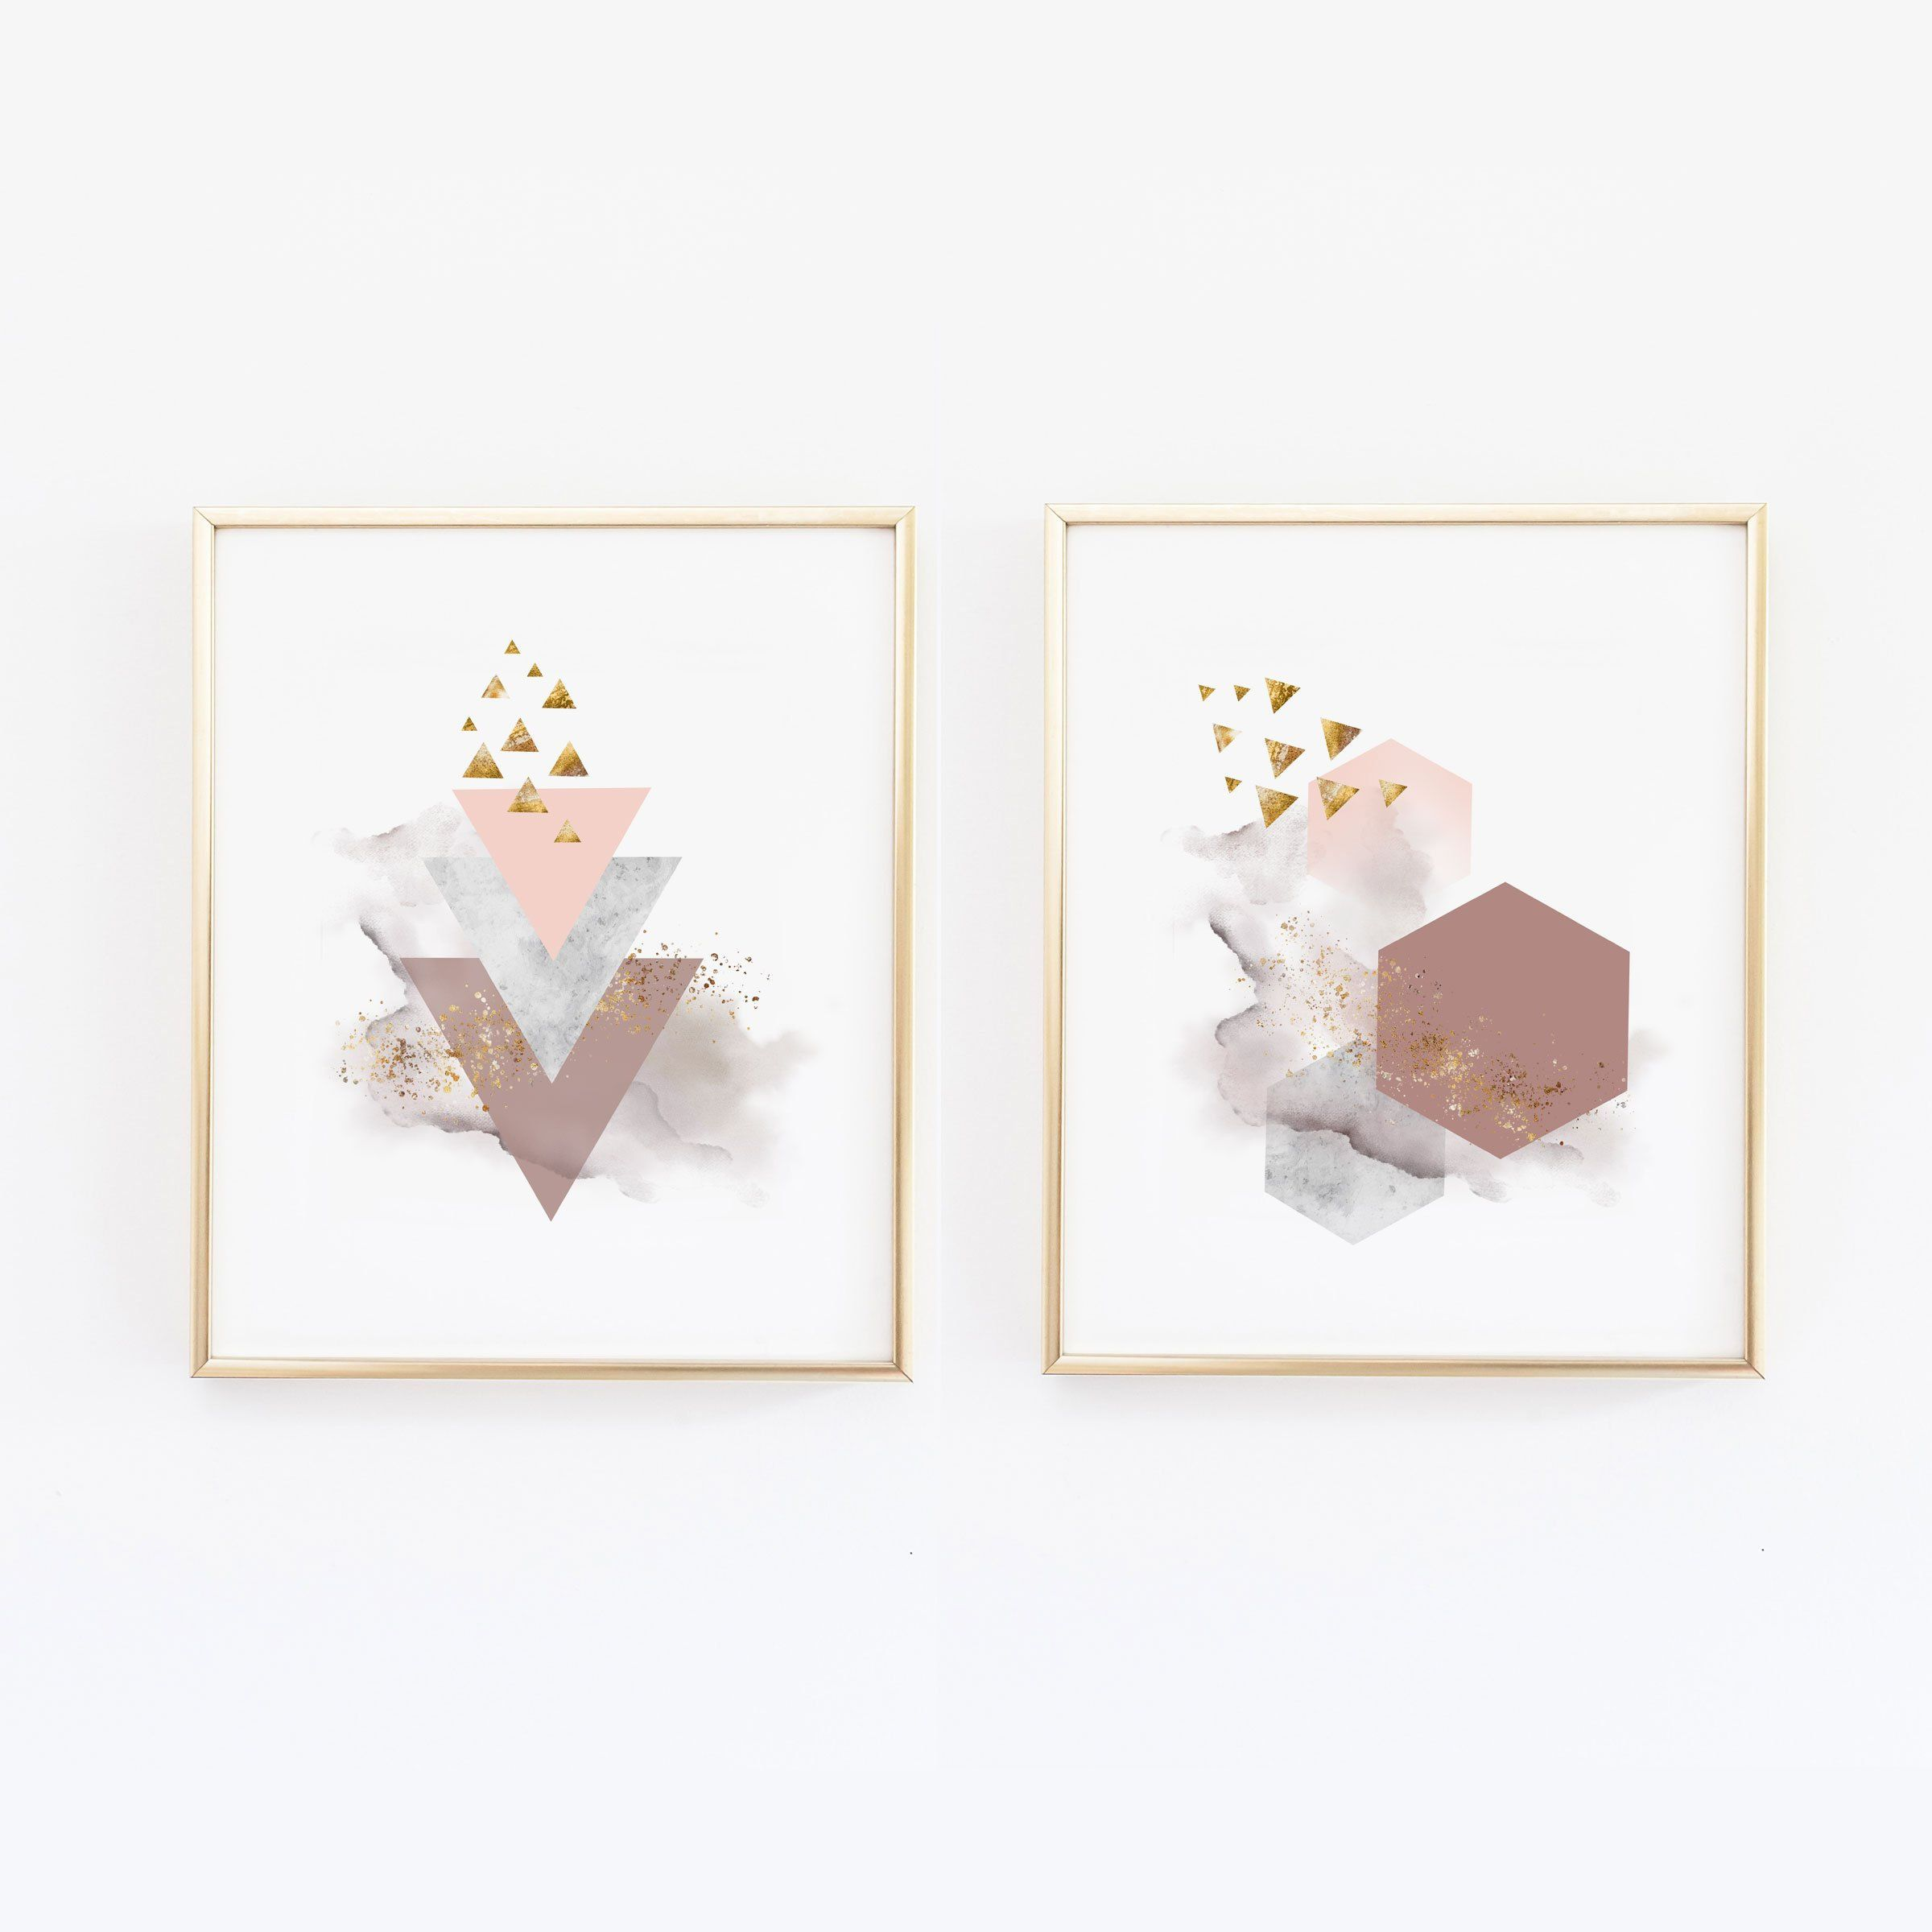 Abstract Shapes Copper Wall Art With Geometric Modern Home Decor Master Bedroom Livingroom Scandinavian Nordic Print Wallandwonder Copper Wall Art Abstract Shapes Wall Art